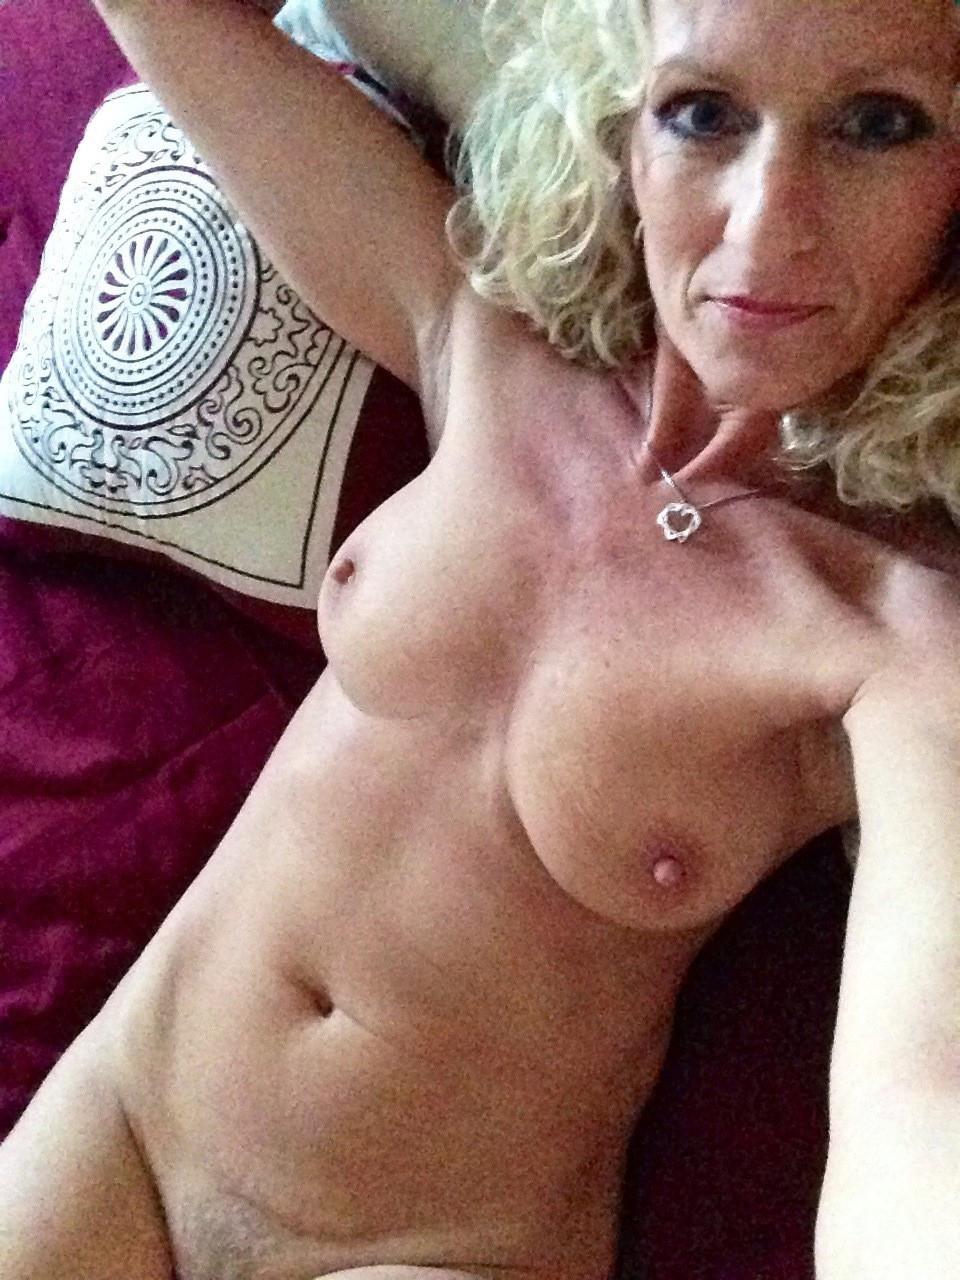 selfshot jocular mater porn pic